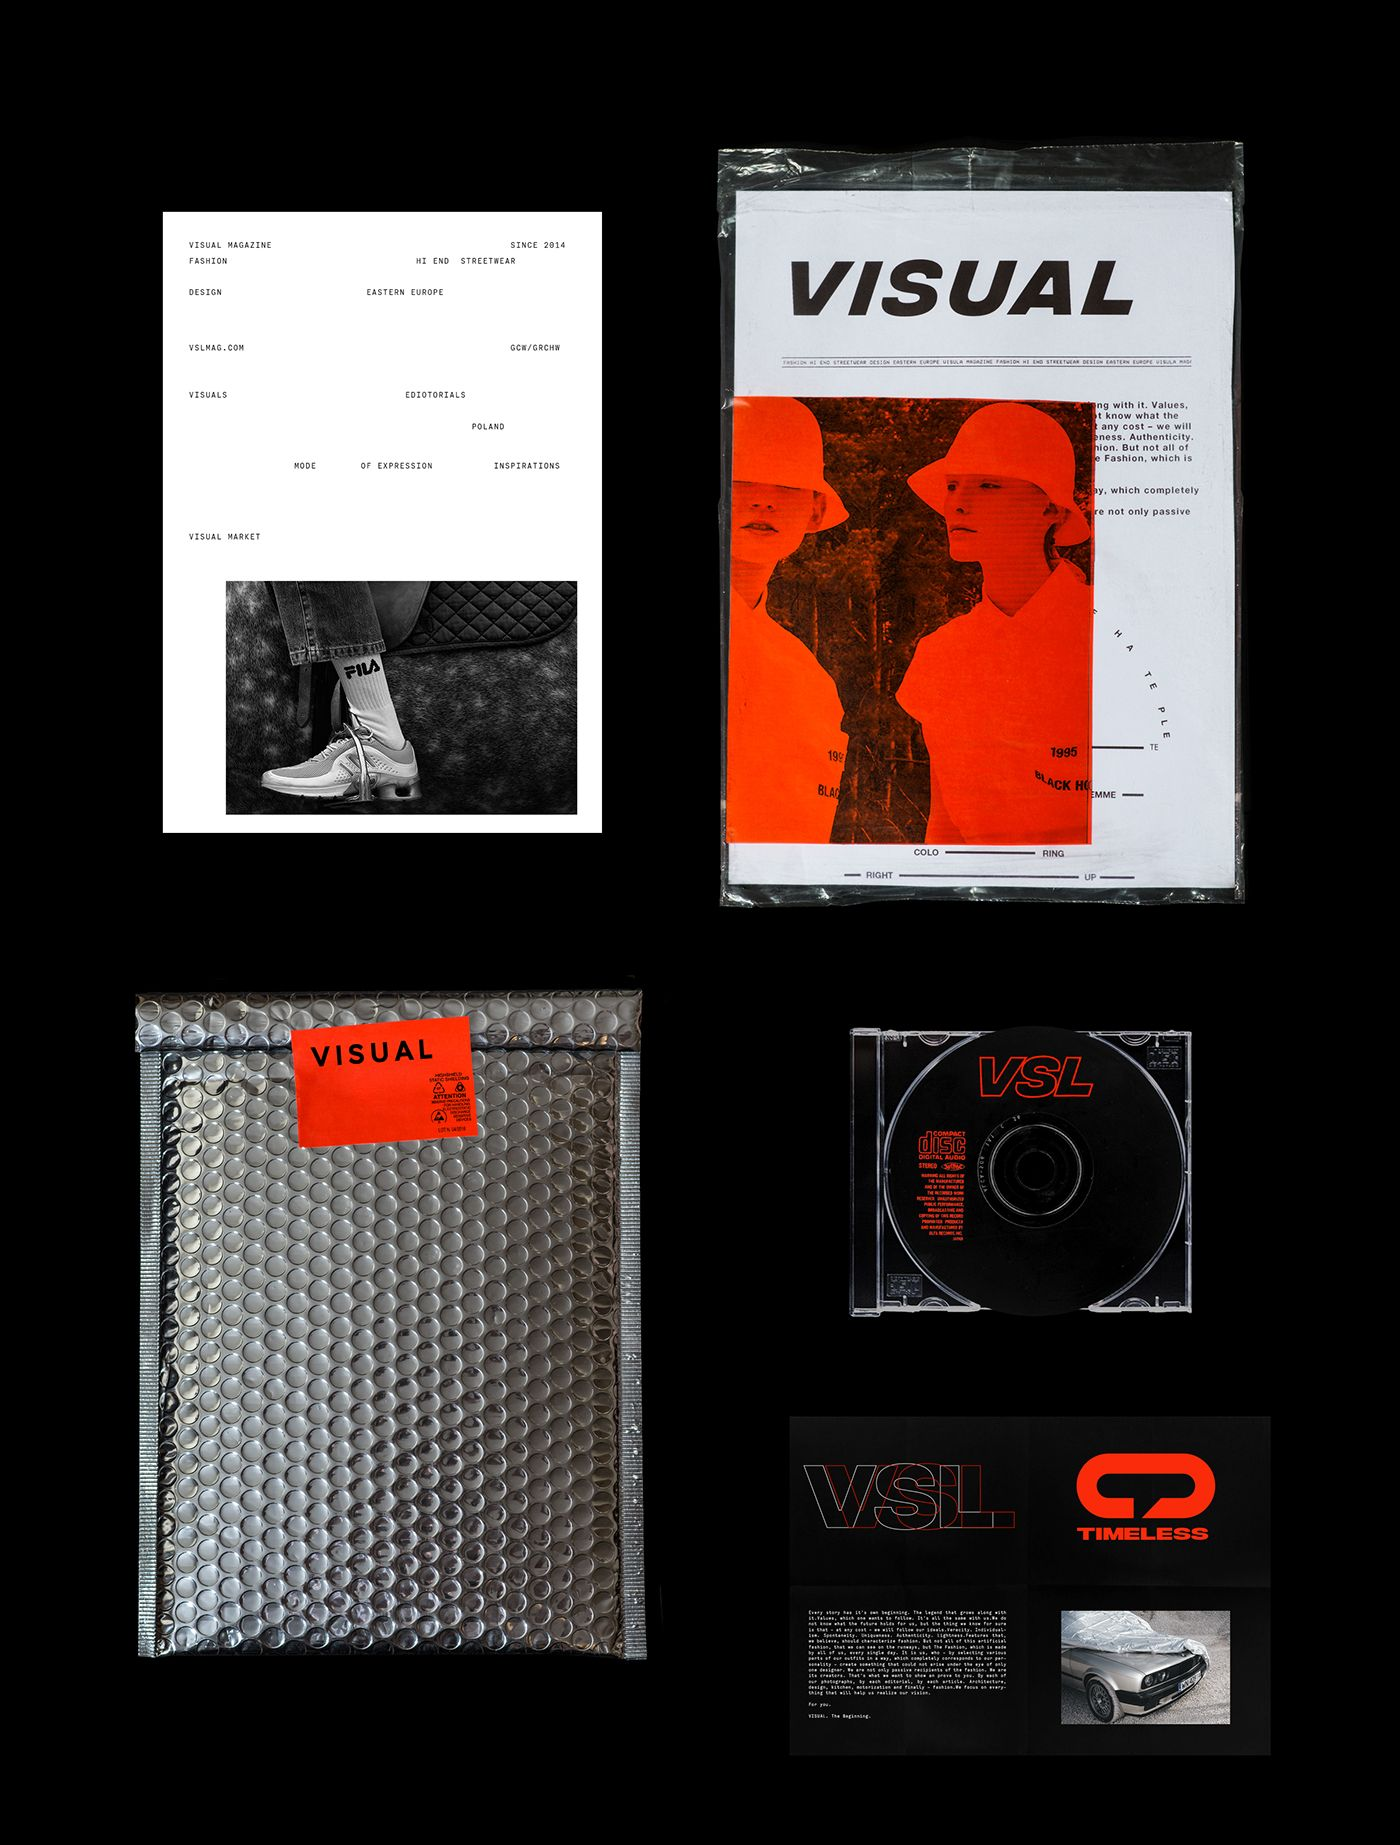 FASHION AND HI-END STREETWEAR DIGITAL MAGAZINE | Art Direction | Web Design | Branding | Photography #artdirection